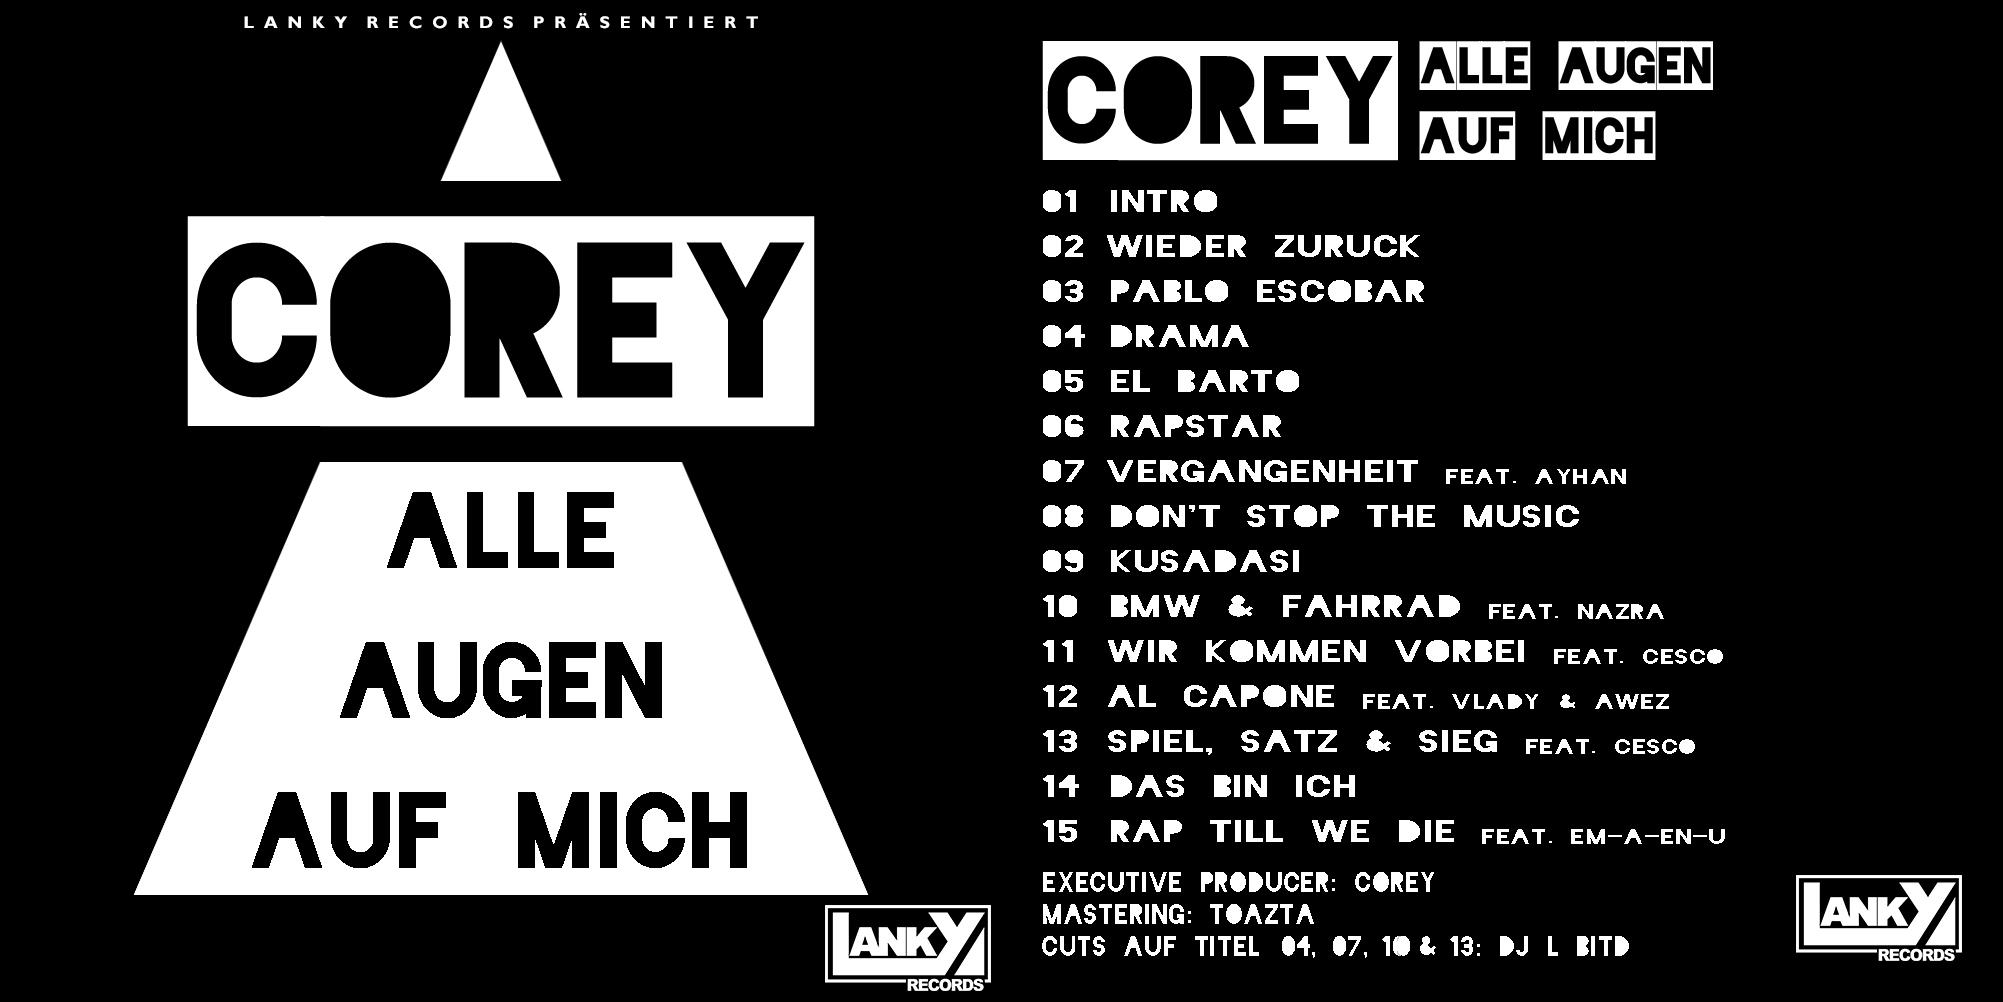 Corey - Alle Augen auf mich Cover